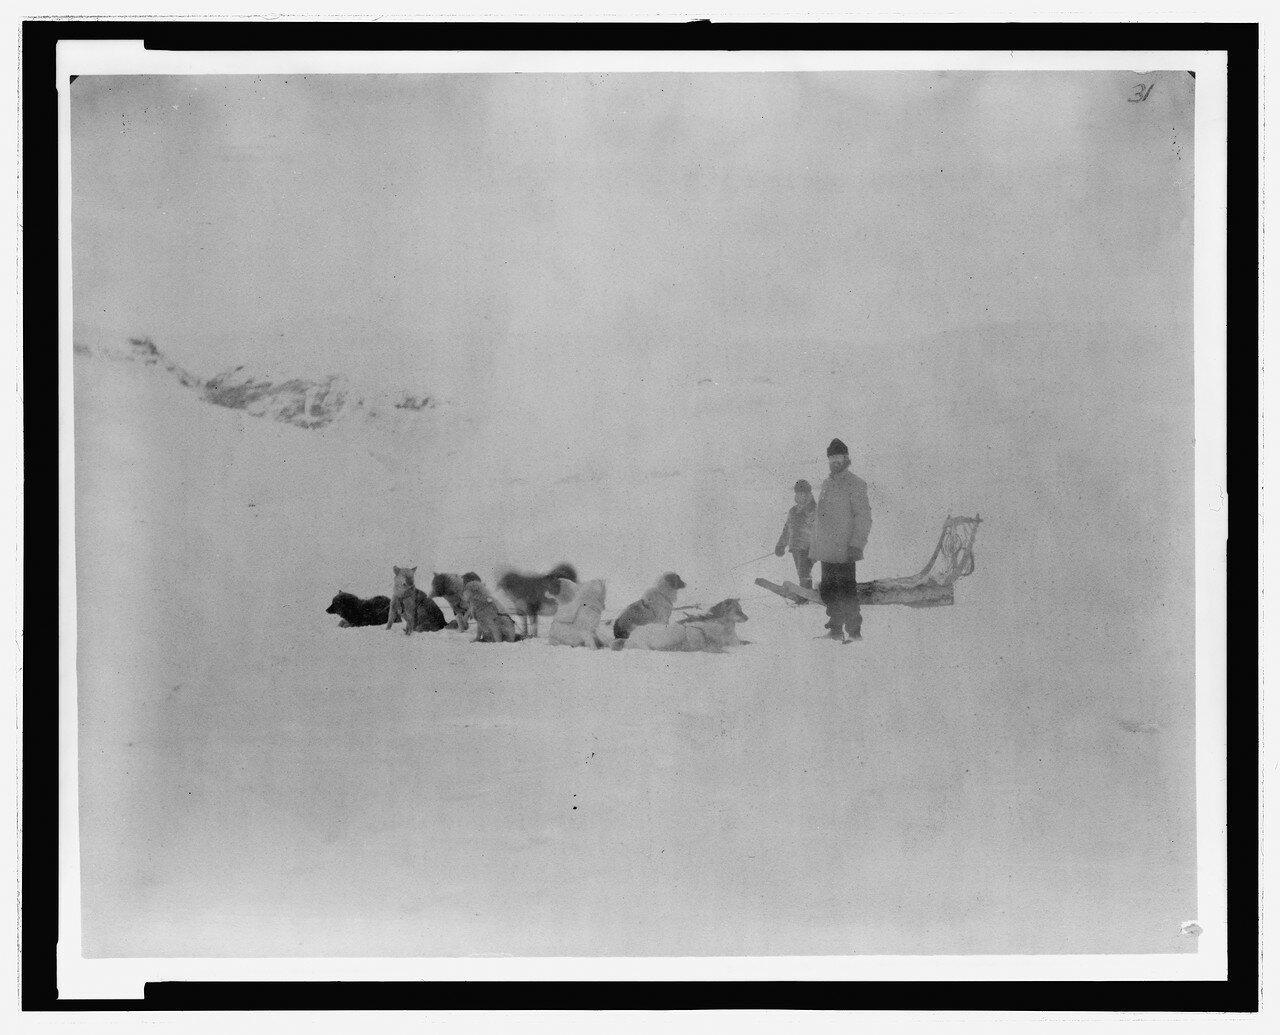 3c36196u лейтенант Greely и Jens с собачьей командой на льдине в гавани Дискавери, 18 октября 1881.jpg